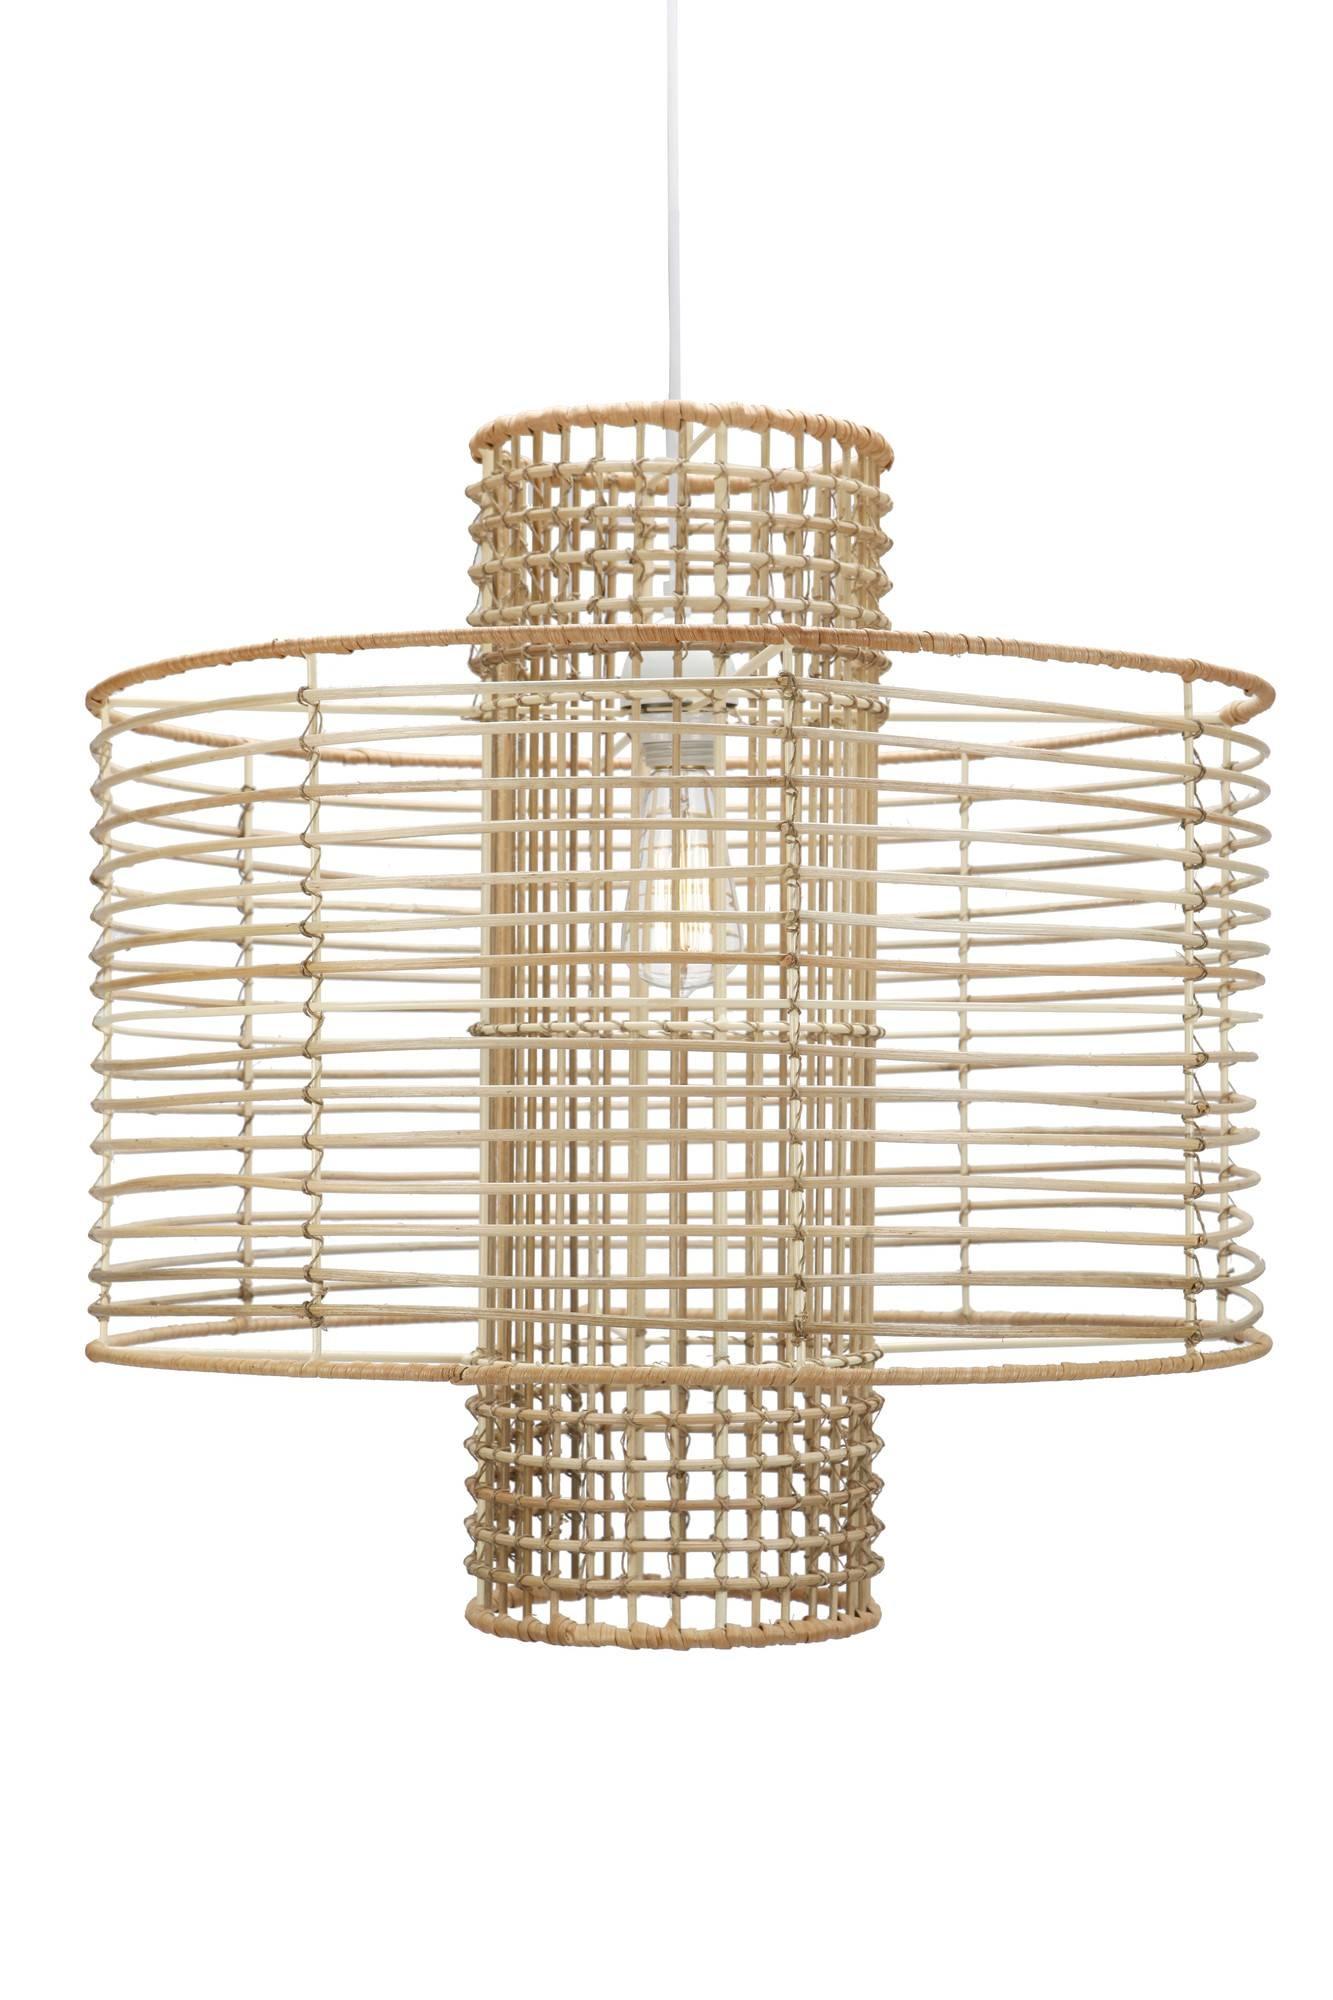 Anthropologie Deco Rattan Pendant Lamp | Decor Look Alikes for Rattan Pendant Lighting (Image 2 of 15)